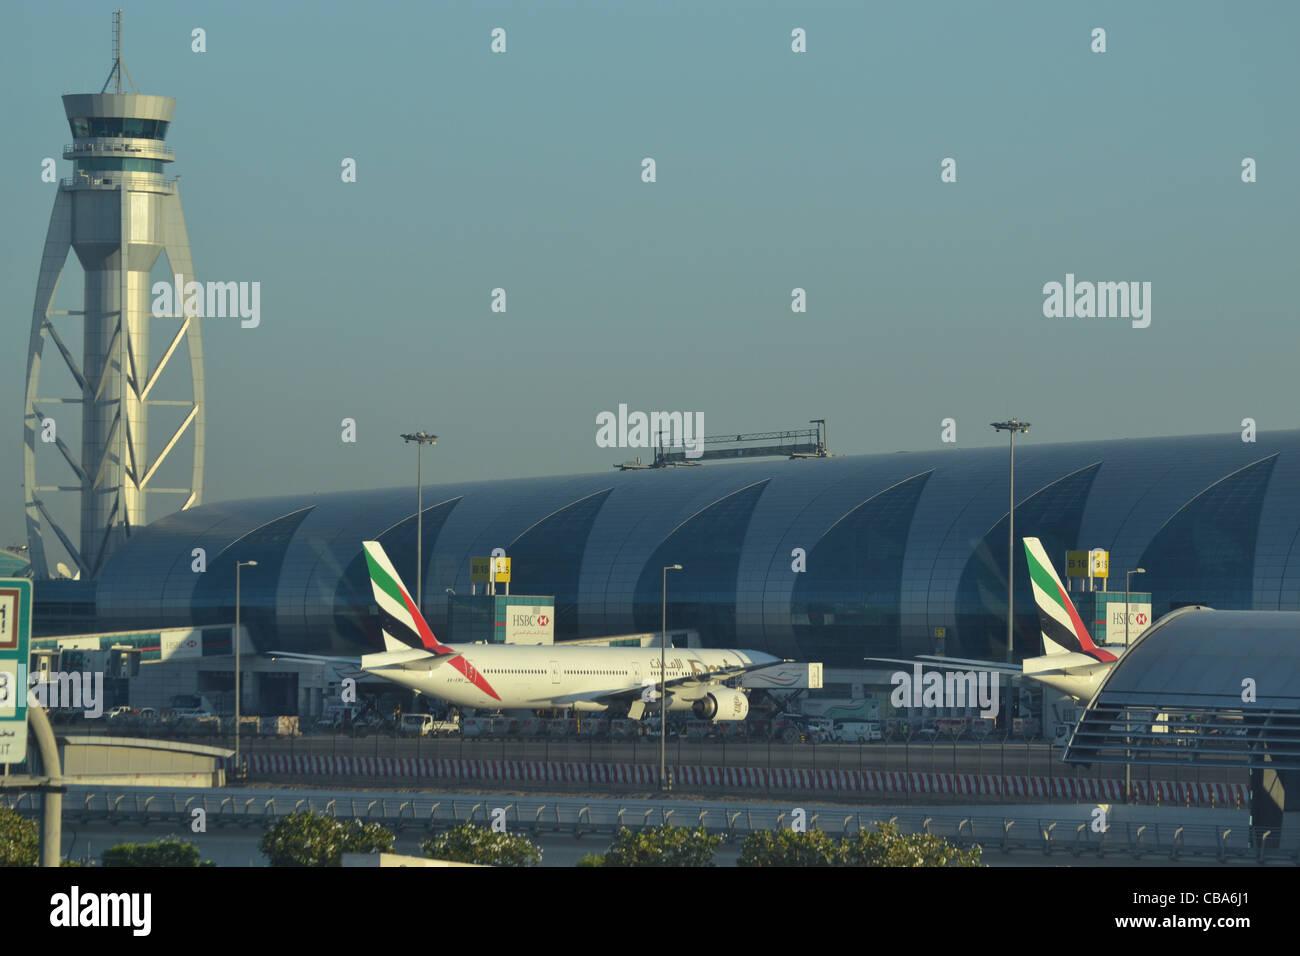 Emirates aircraft and control tower at Dubai Airport, DXB, United Arab Emirates - Stock Image